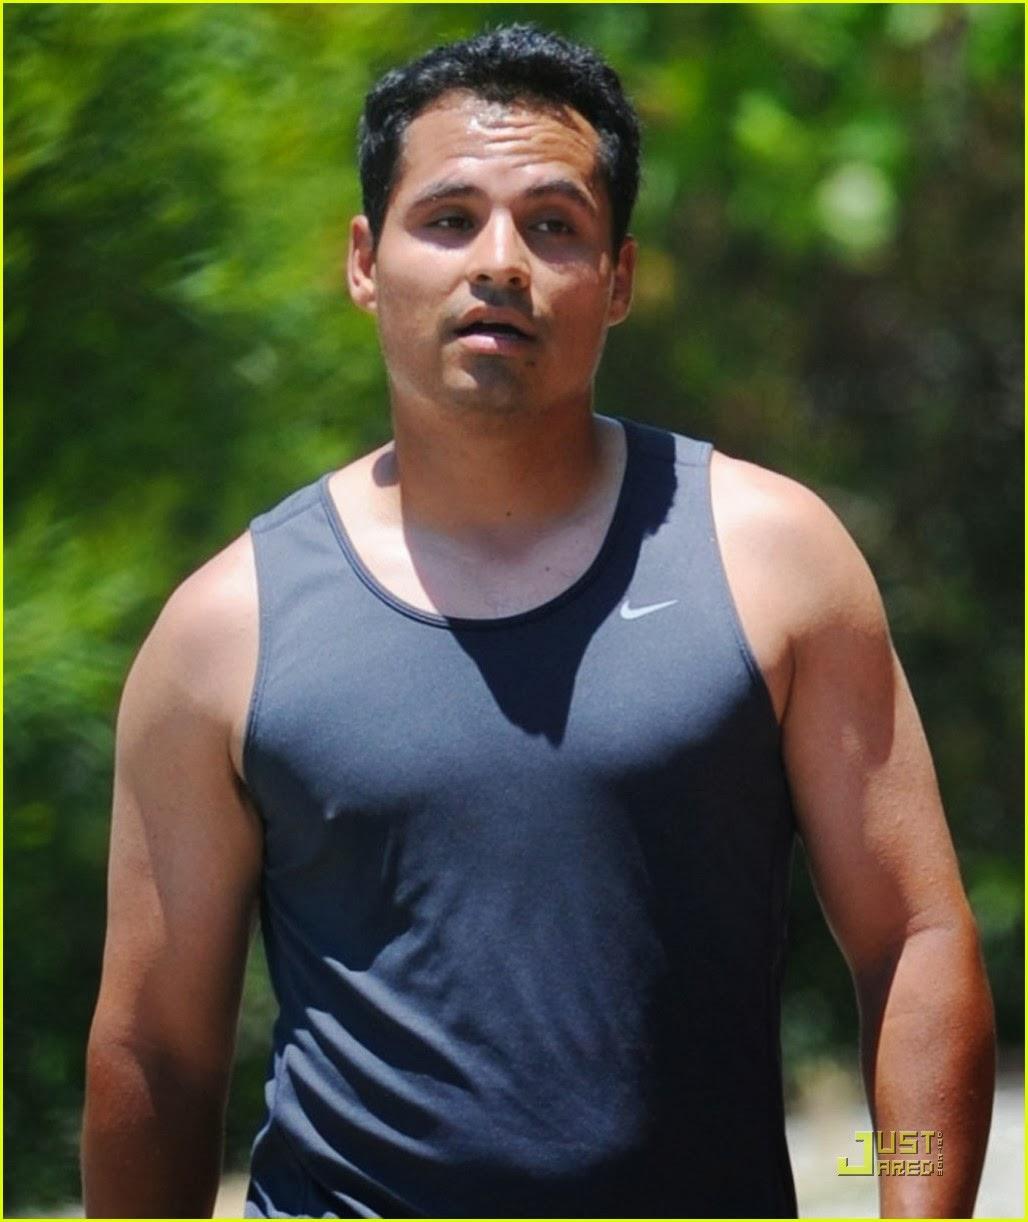 jake-gyllenhaal-joggin... Jake Gyllenhaal